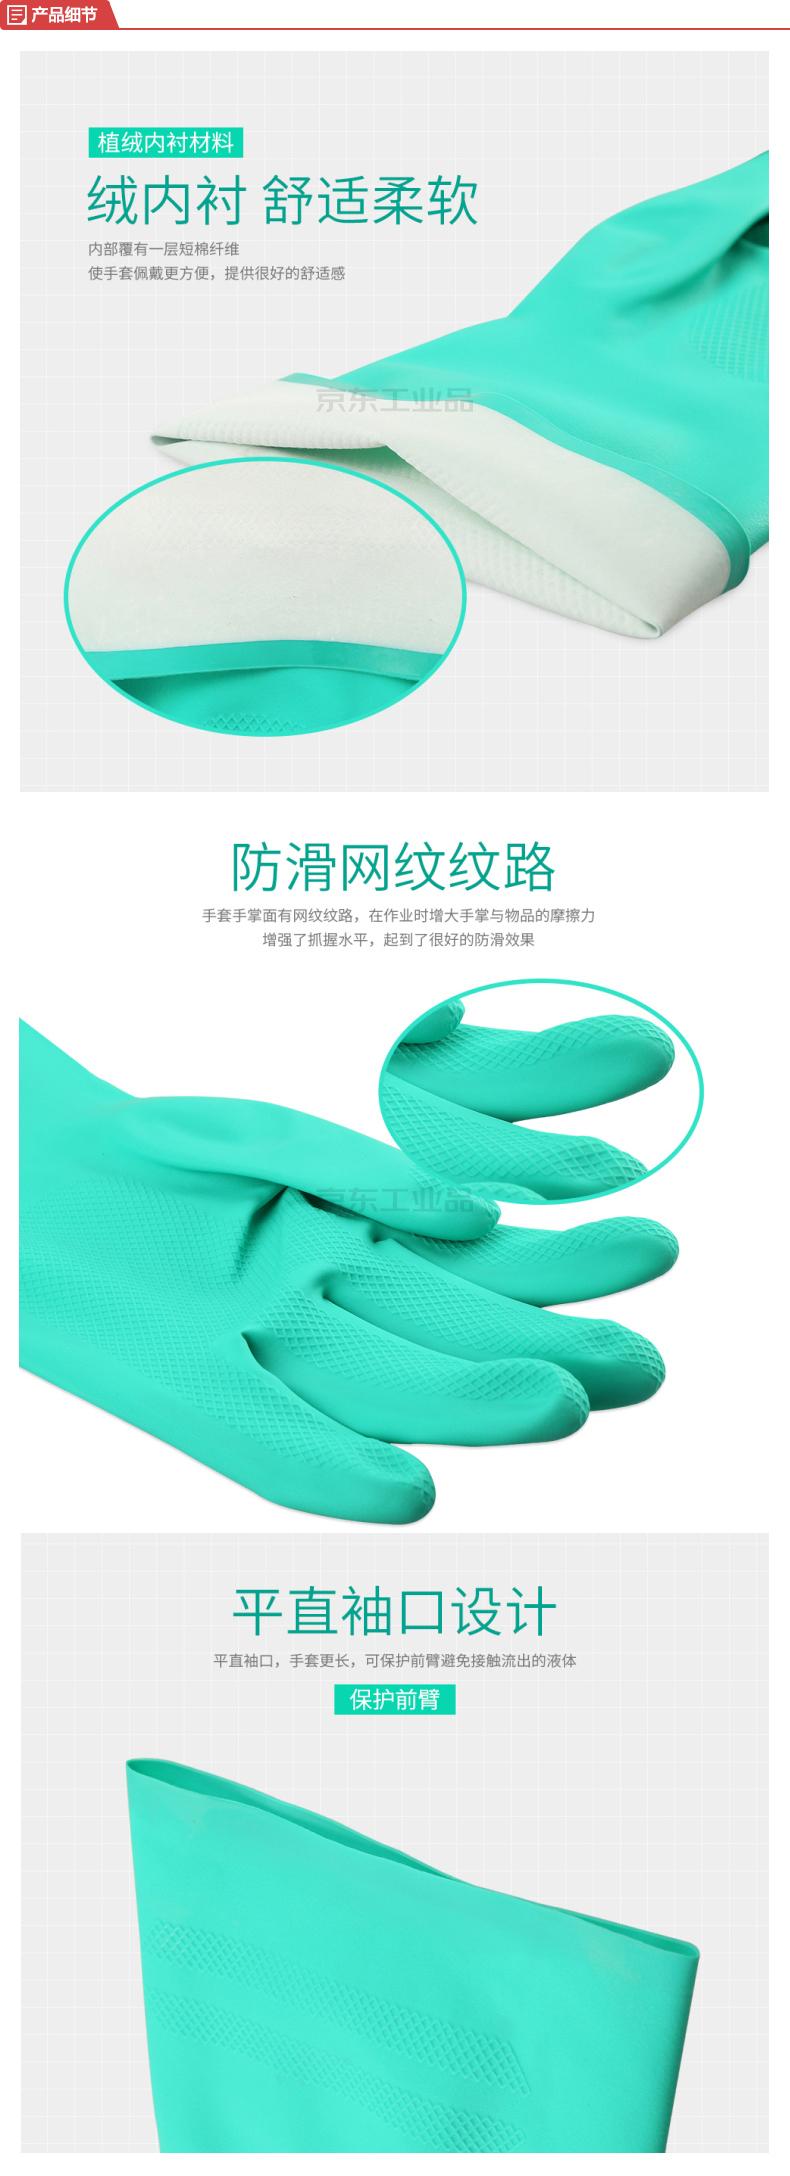 Ansell安思尔 手套 抗溶剂腈胶棉植绒,亚洲版,0.38mm厚,33cm长;37-176-9